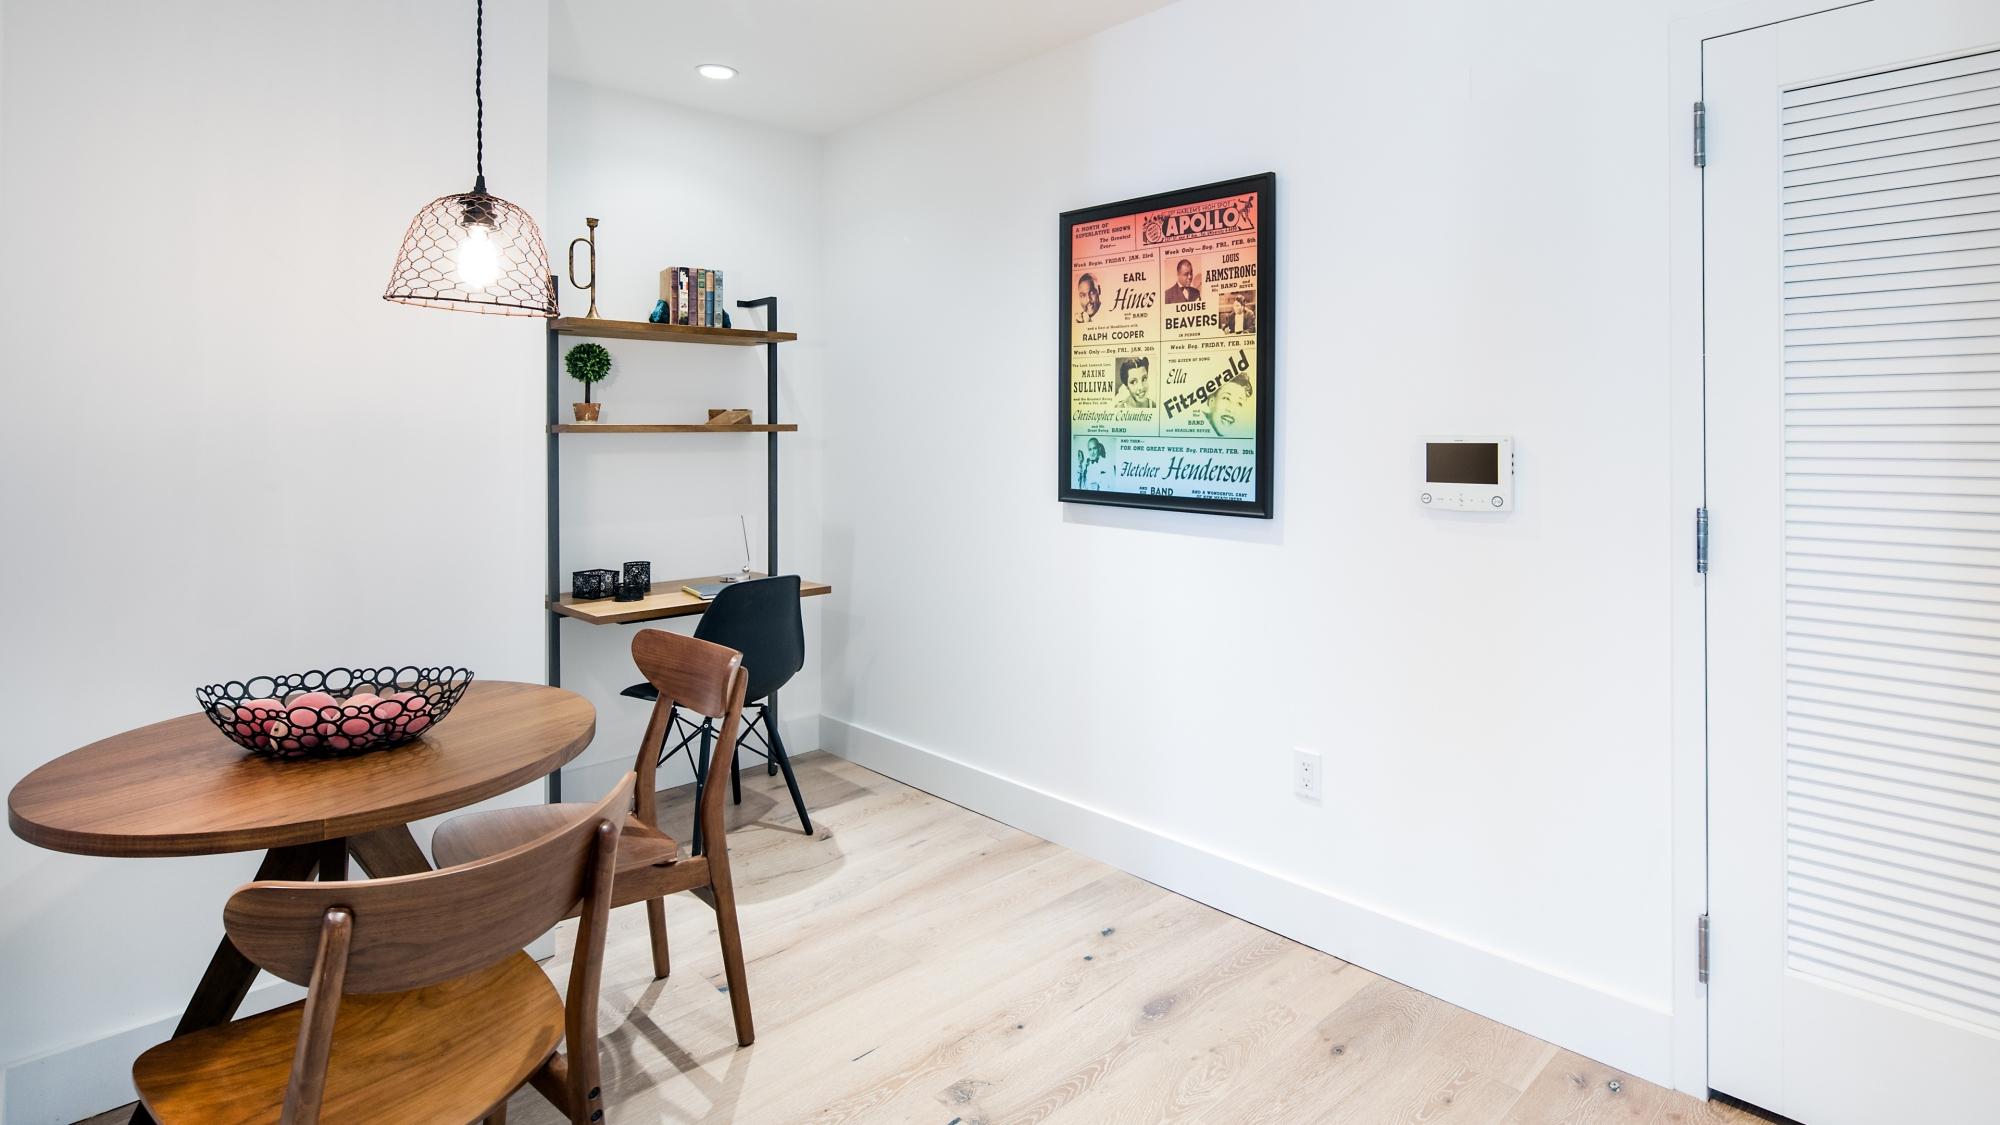 Harlem 125, 69 East 125th Street, NYC - Rental Apartments